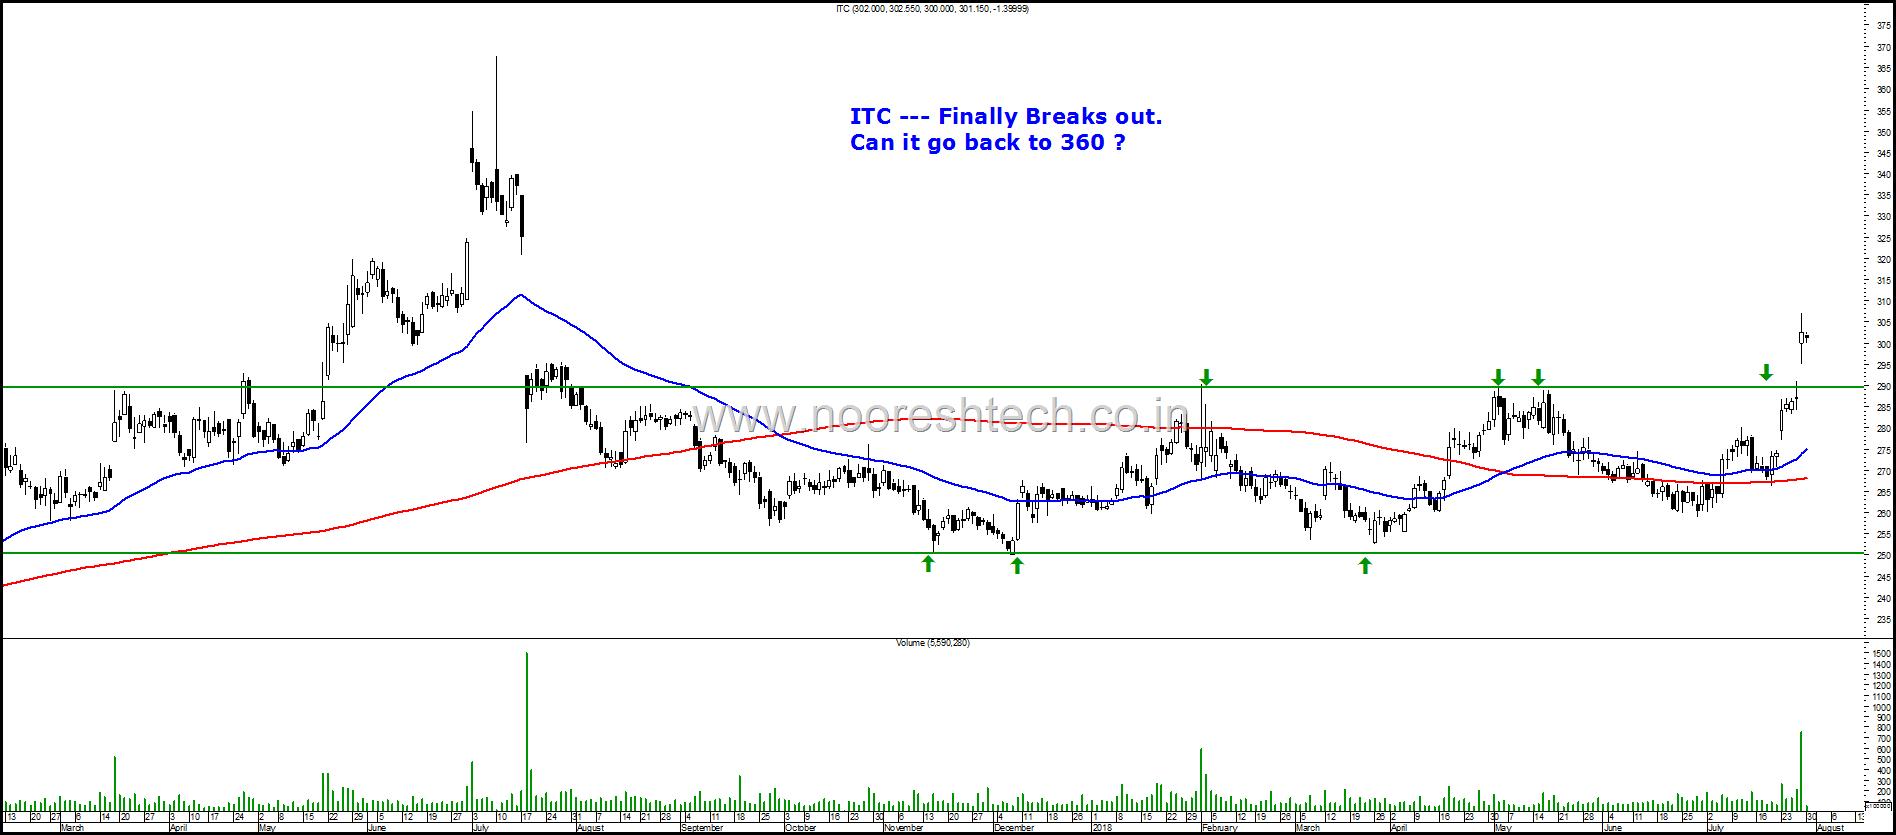 ITC chart